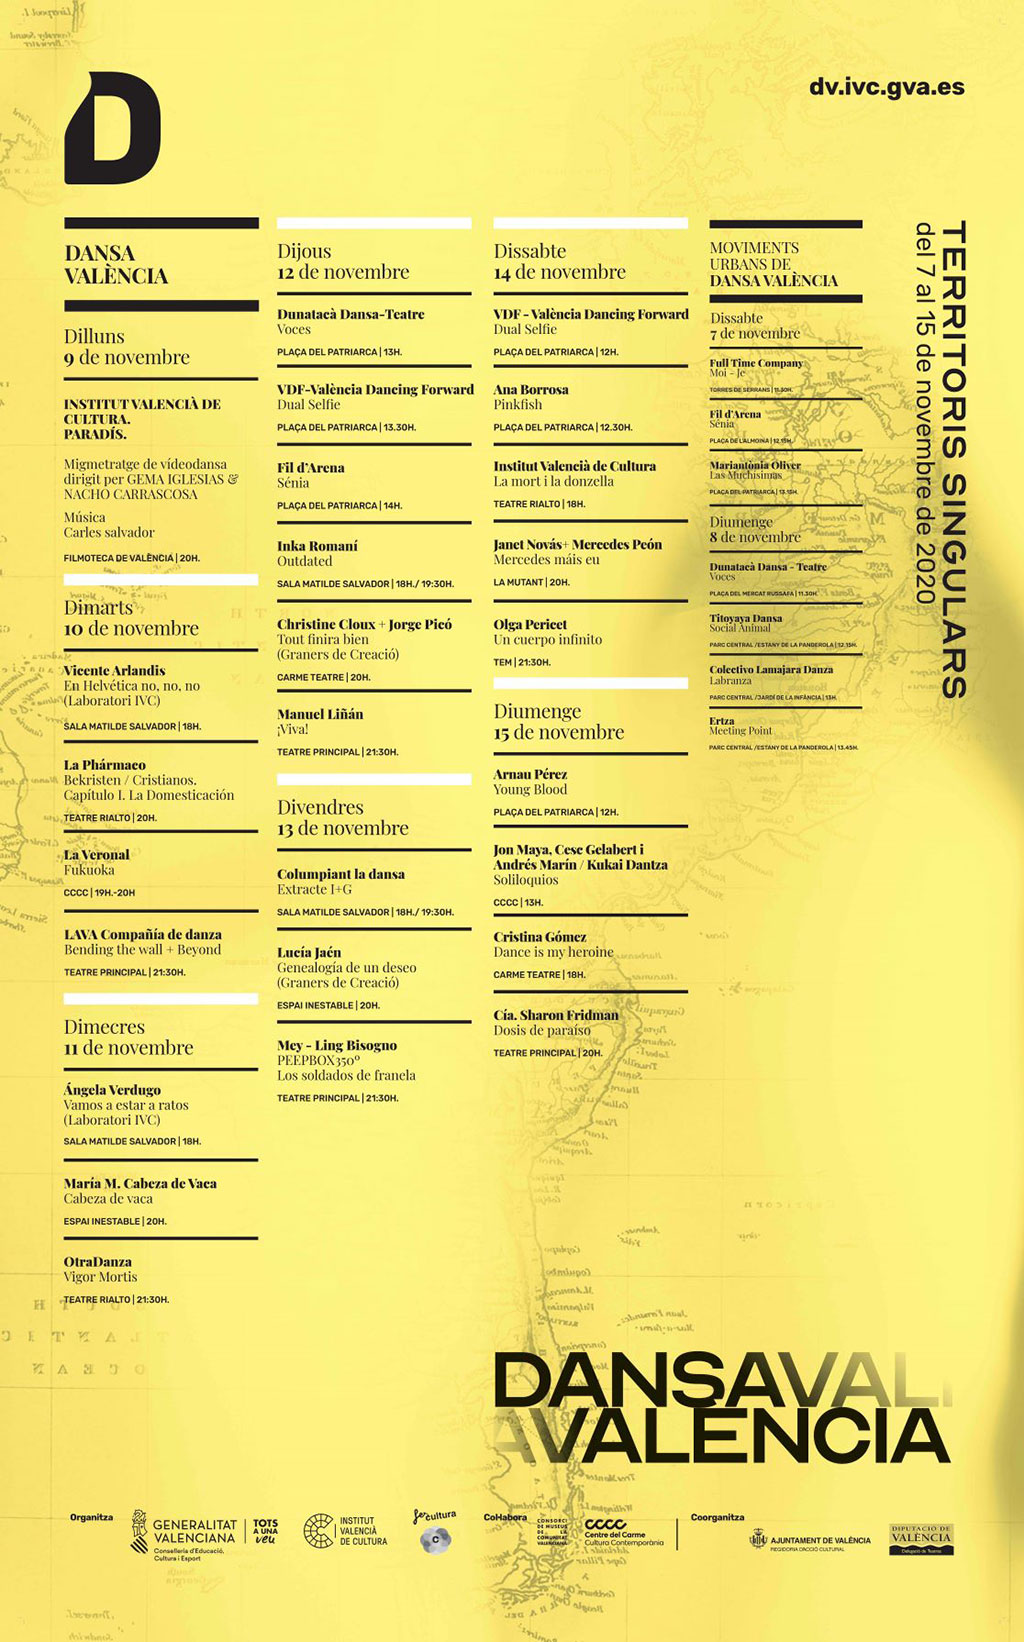 Dansa Valencia 2020: Программа